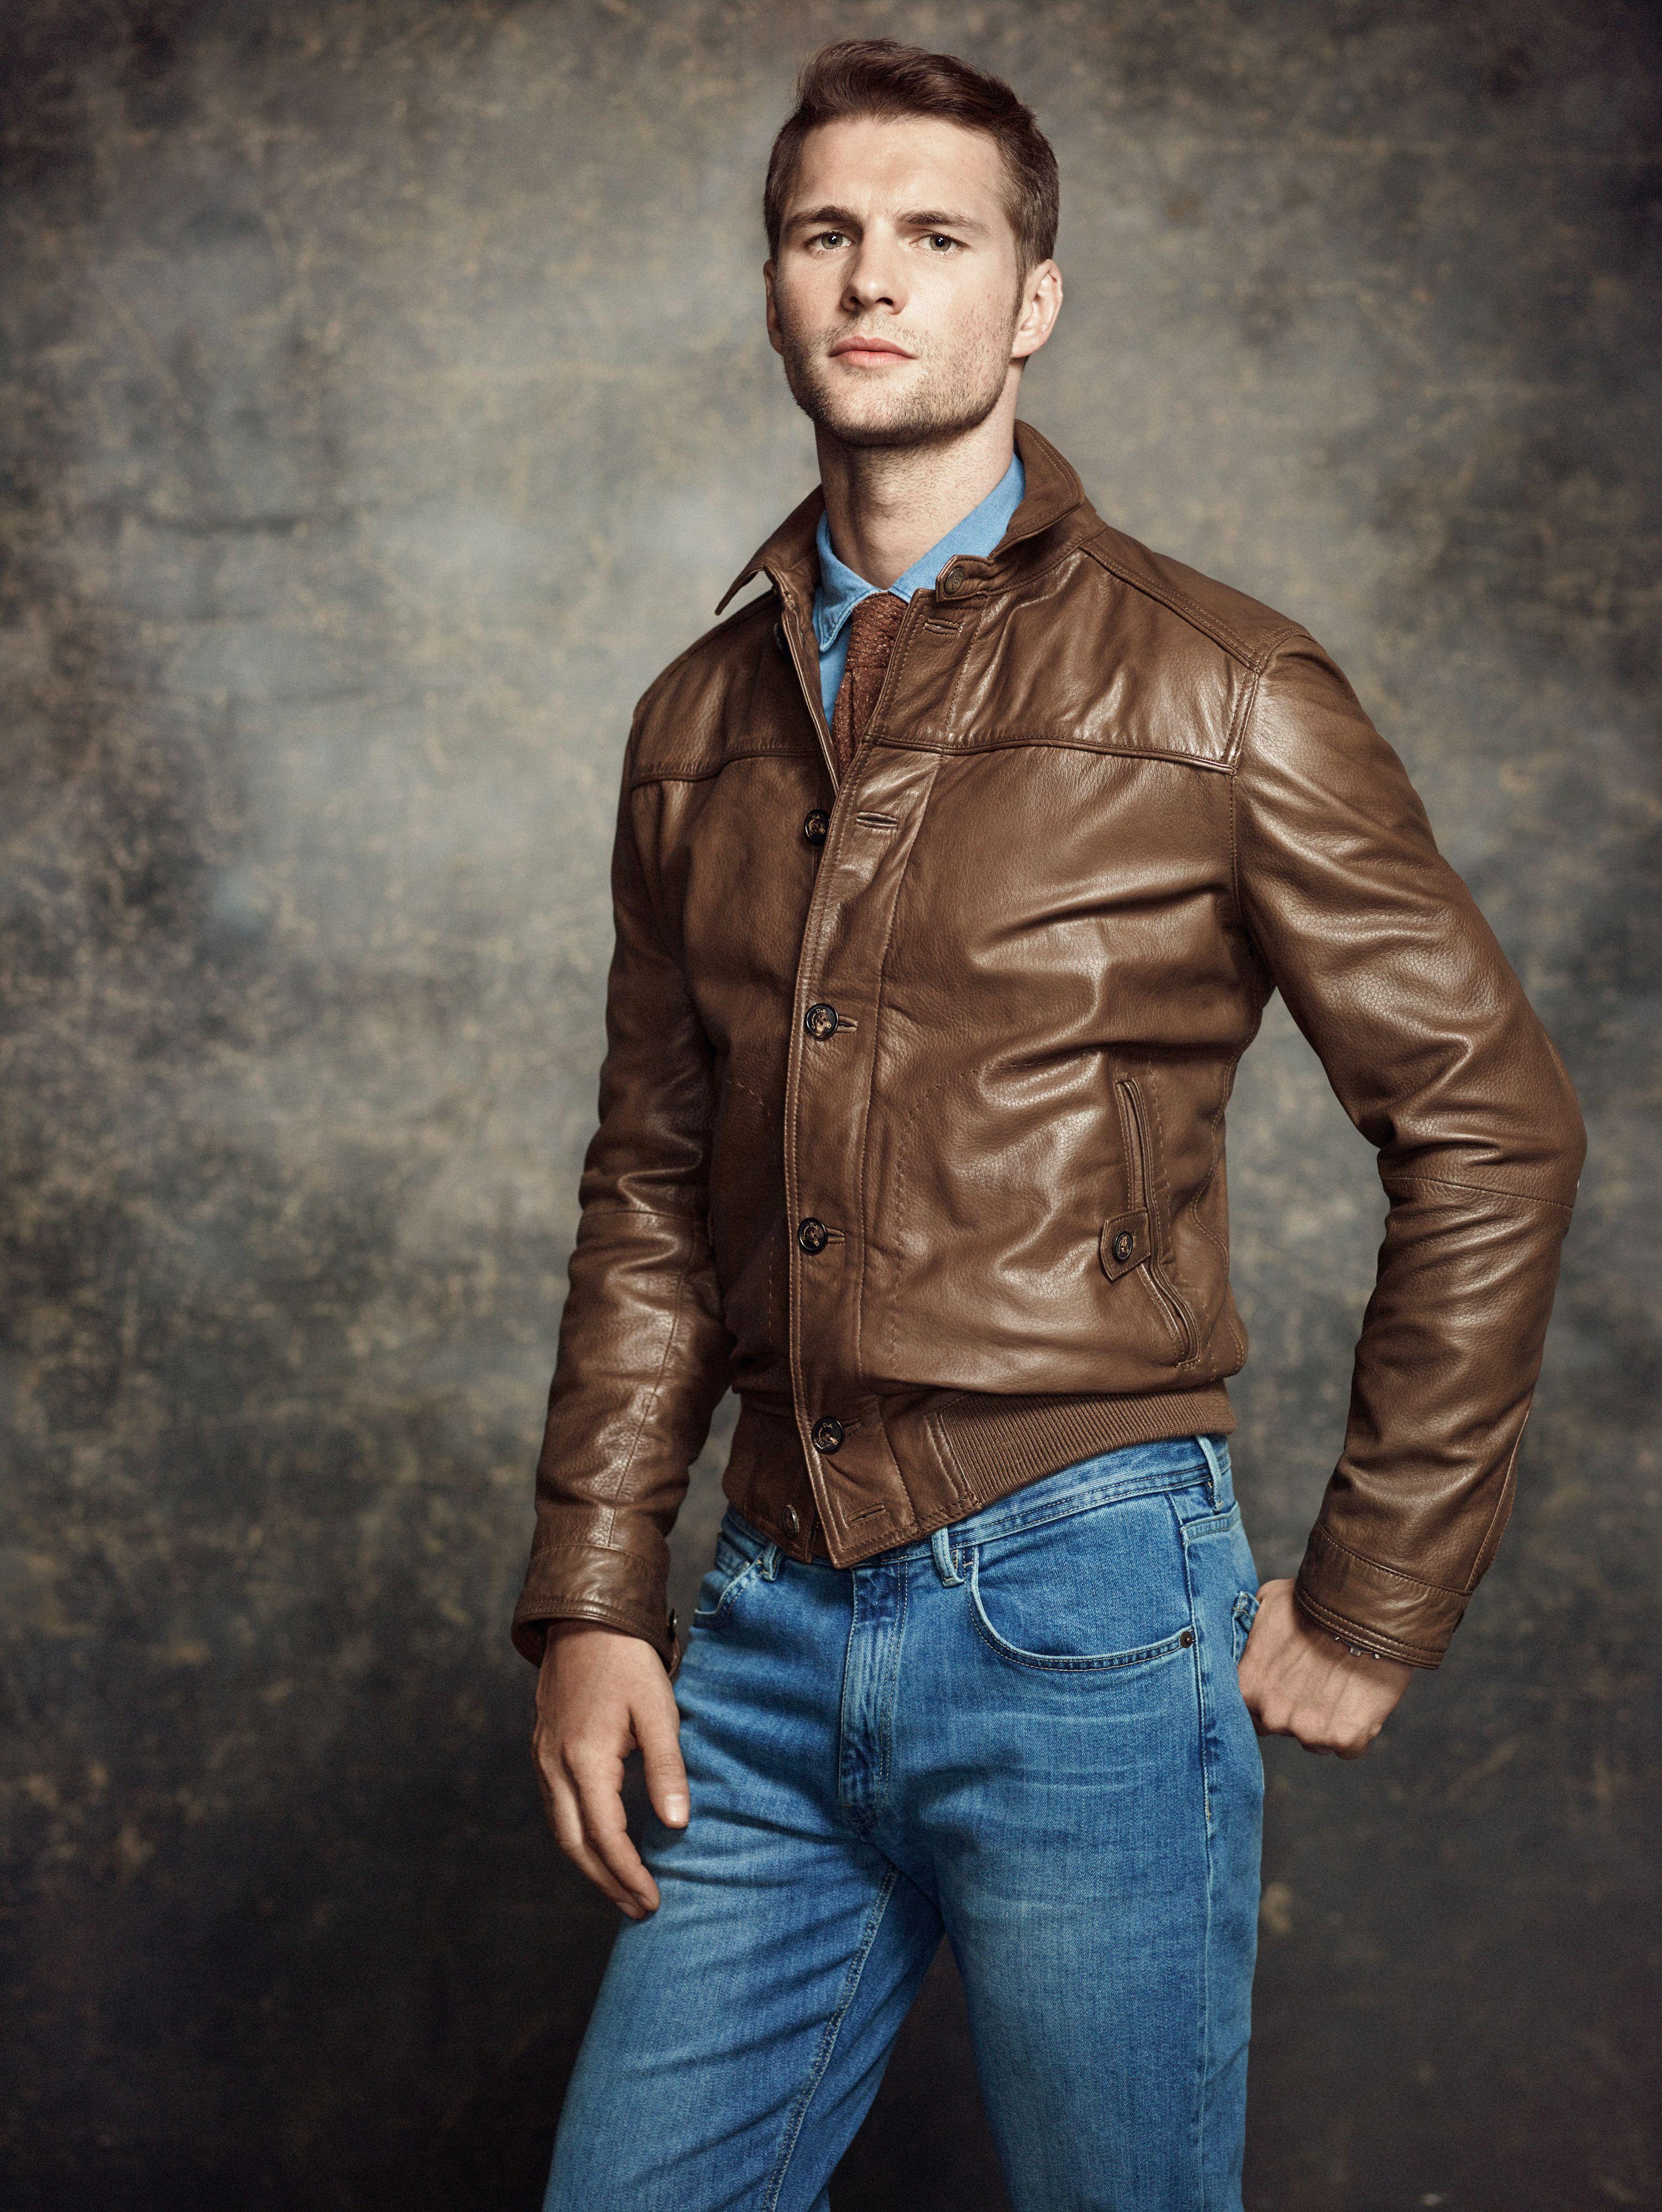 Brown leather jacket, denim shirt, brown knit tie, blue